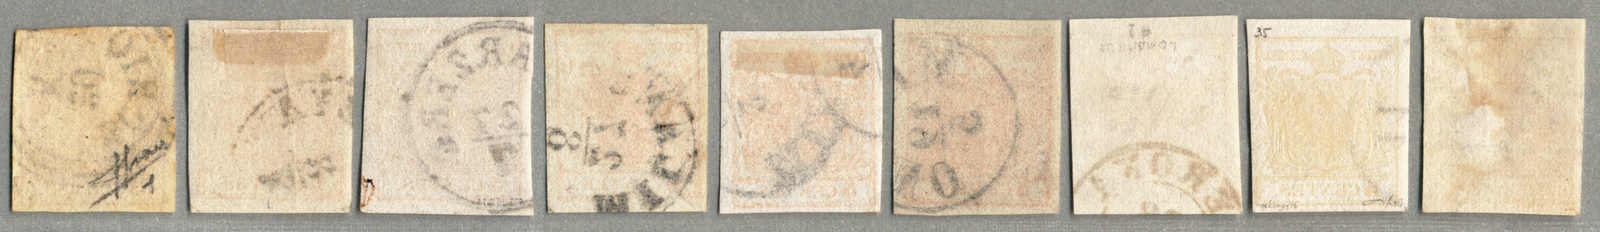 Lot 10287 - lombardy venetia  -  classicphil GmbH 5'th classicphil Auction - VIENNA- AUSTRIA